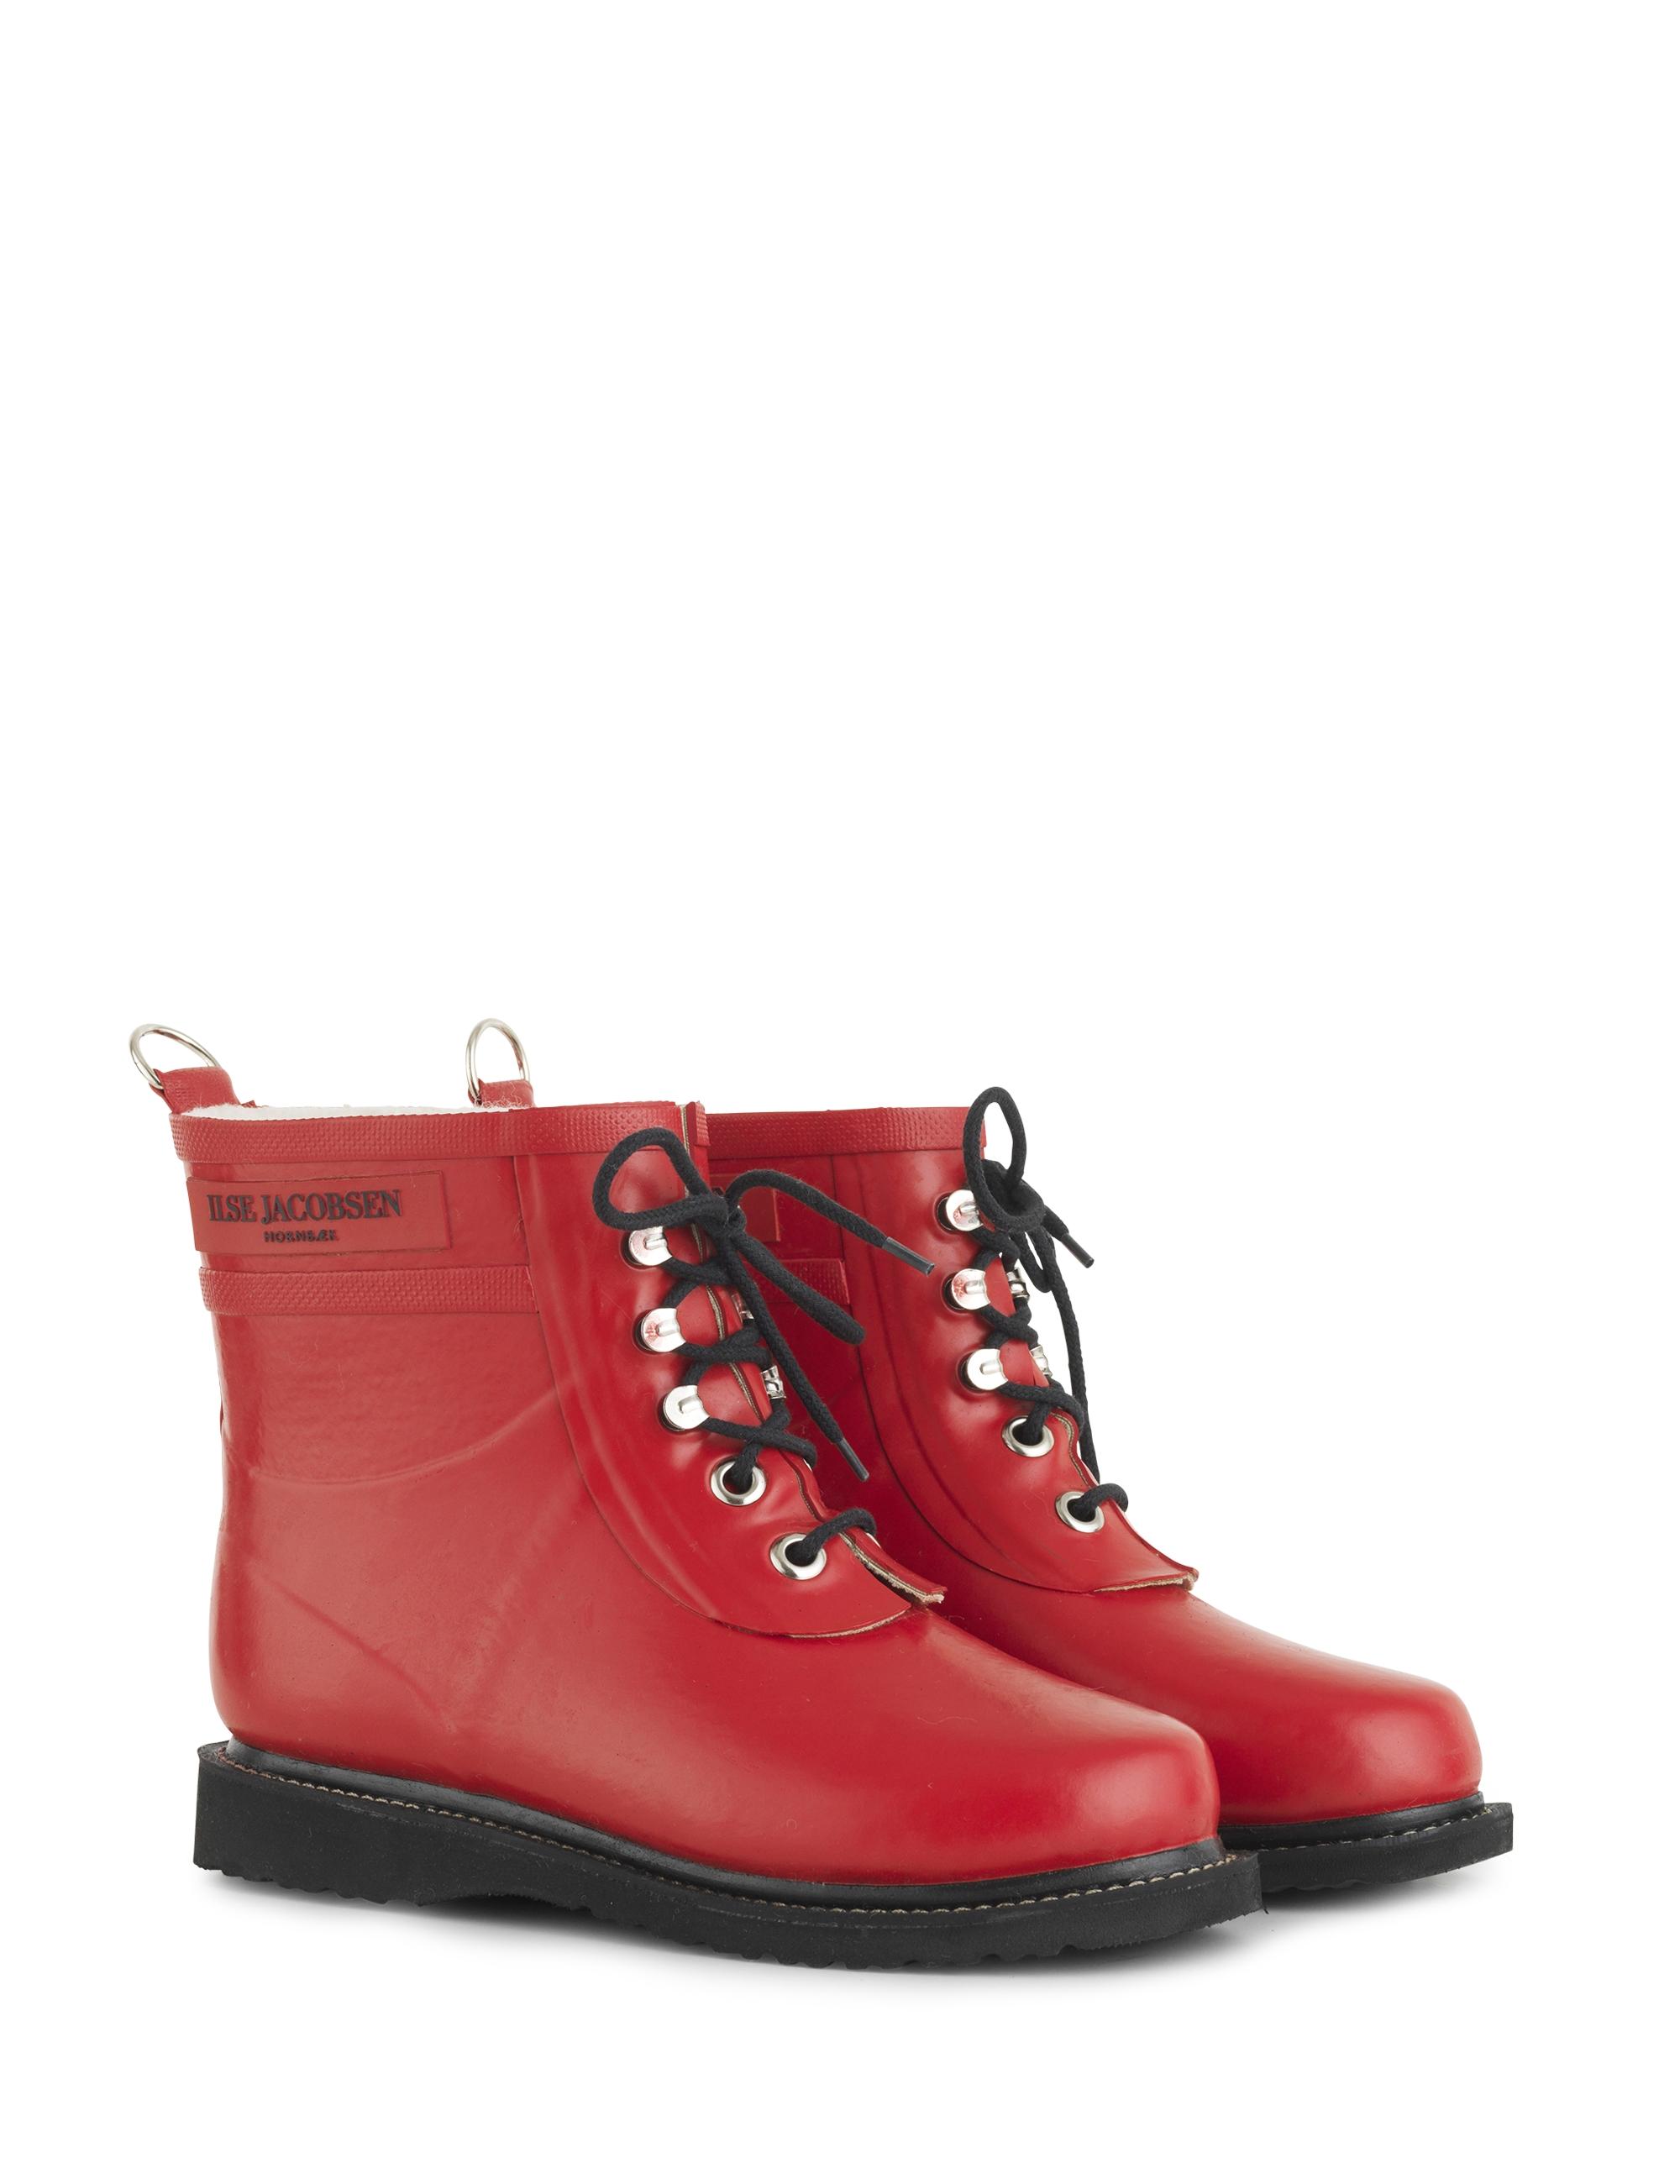 Ilse Jacobsen gummistøvle, kort, deep red, 36